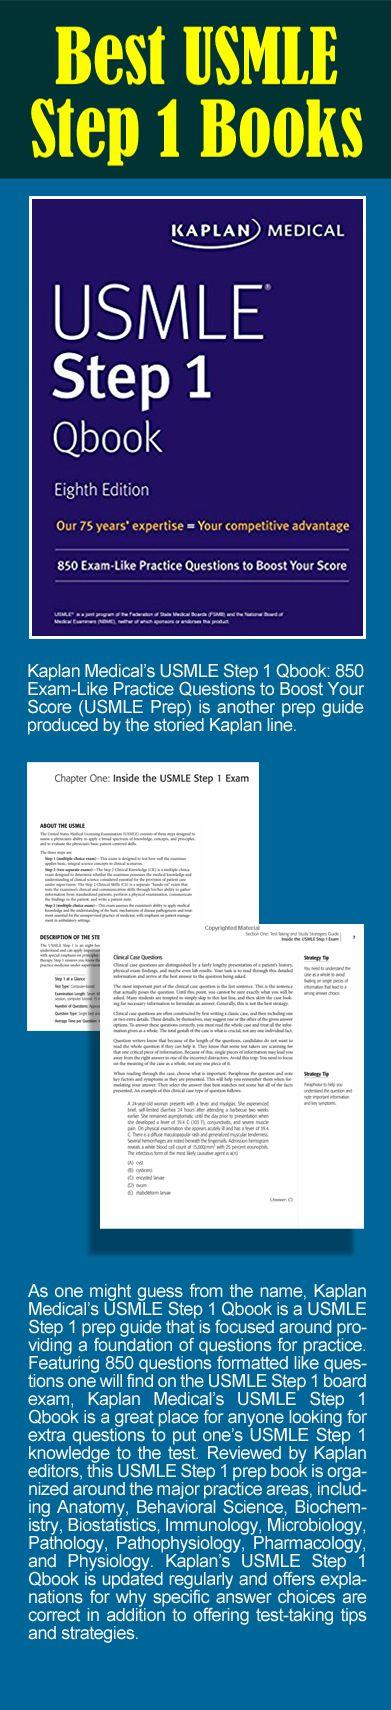 Kaplan Medical's USMLE Step 1 Qbook: 850 Exam-Like Practice